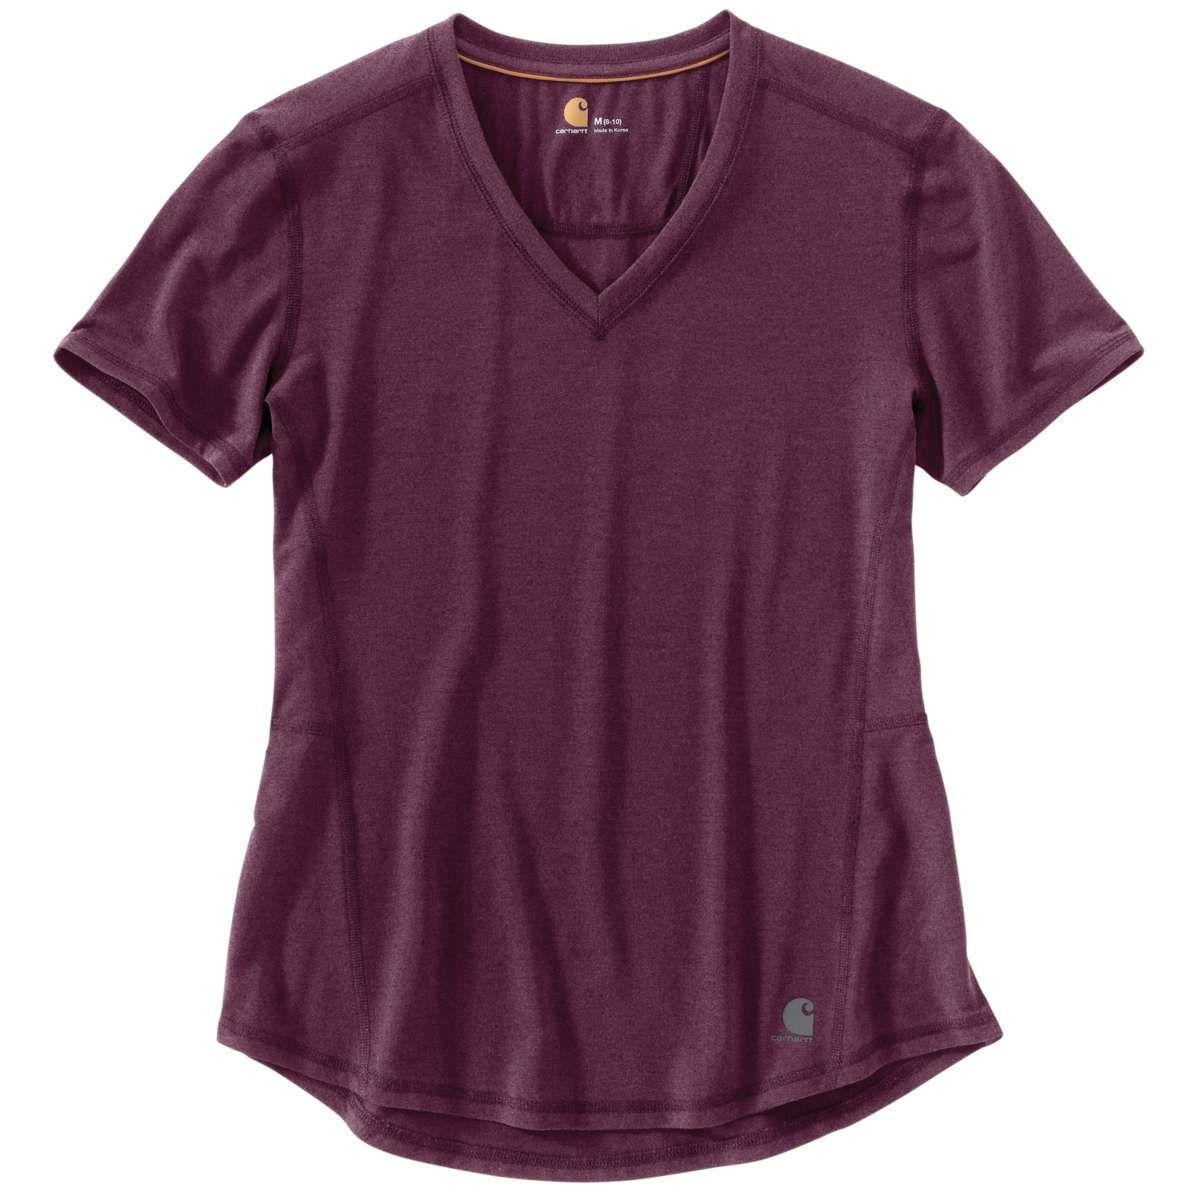 71c18a88c1bb16 Carhartt Women s Potent Purple Heather Force Ferndale Short Sleeve T-Shirt